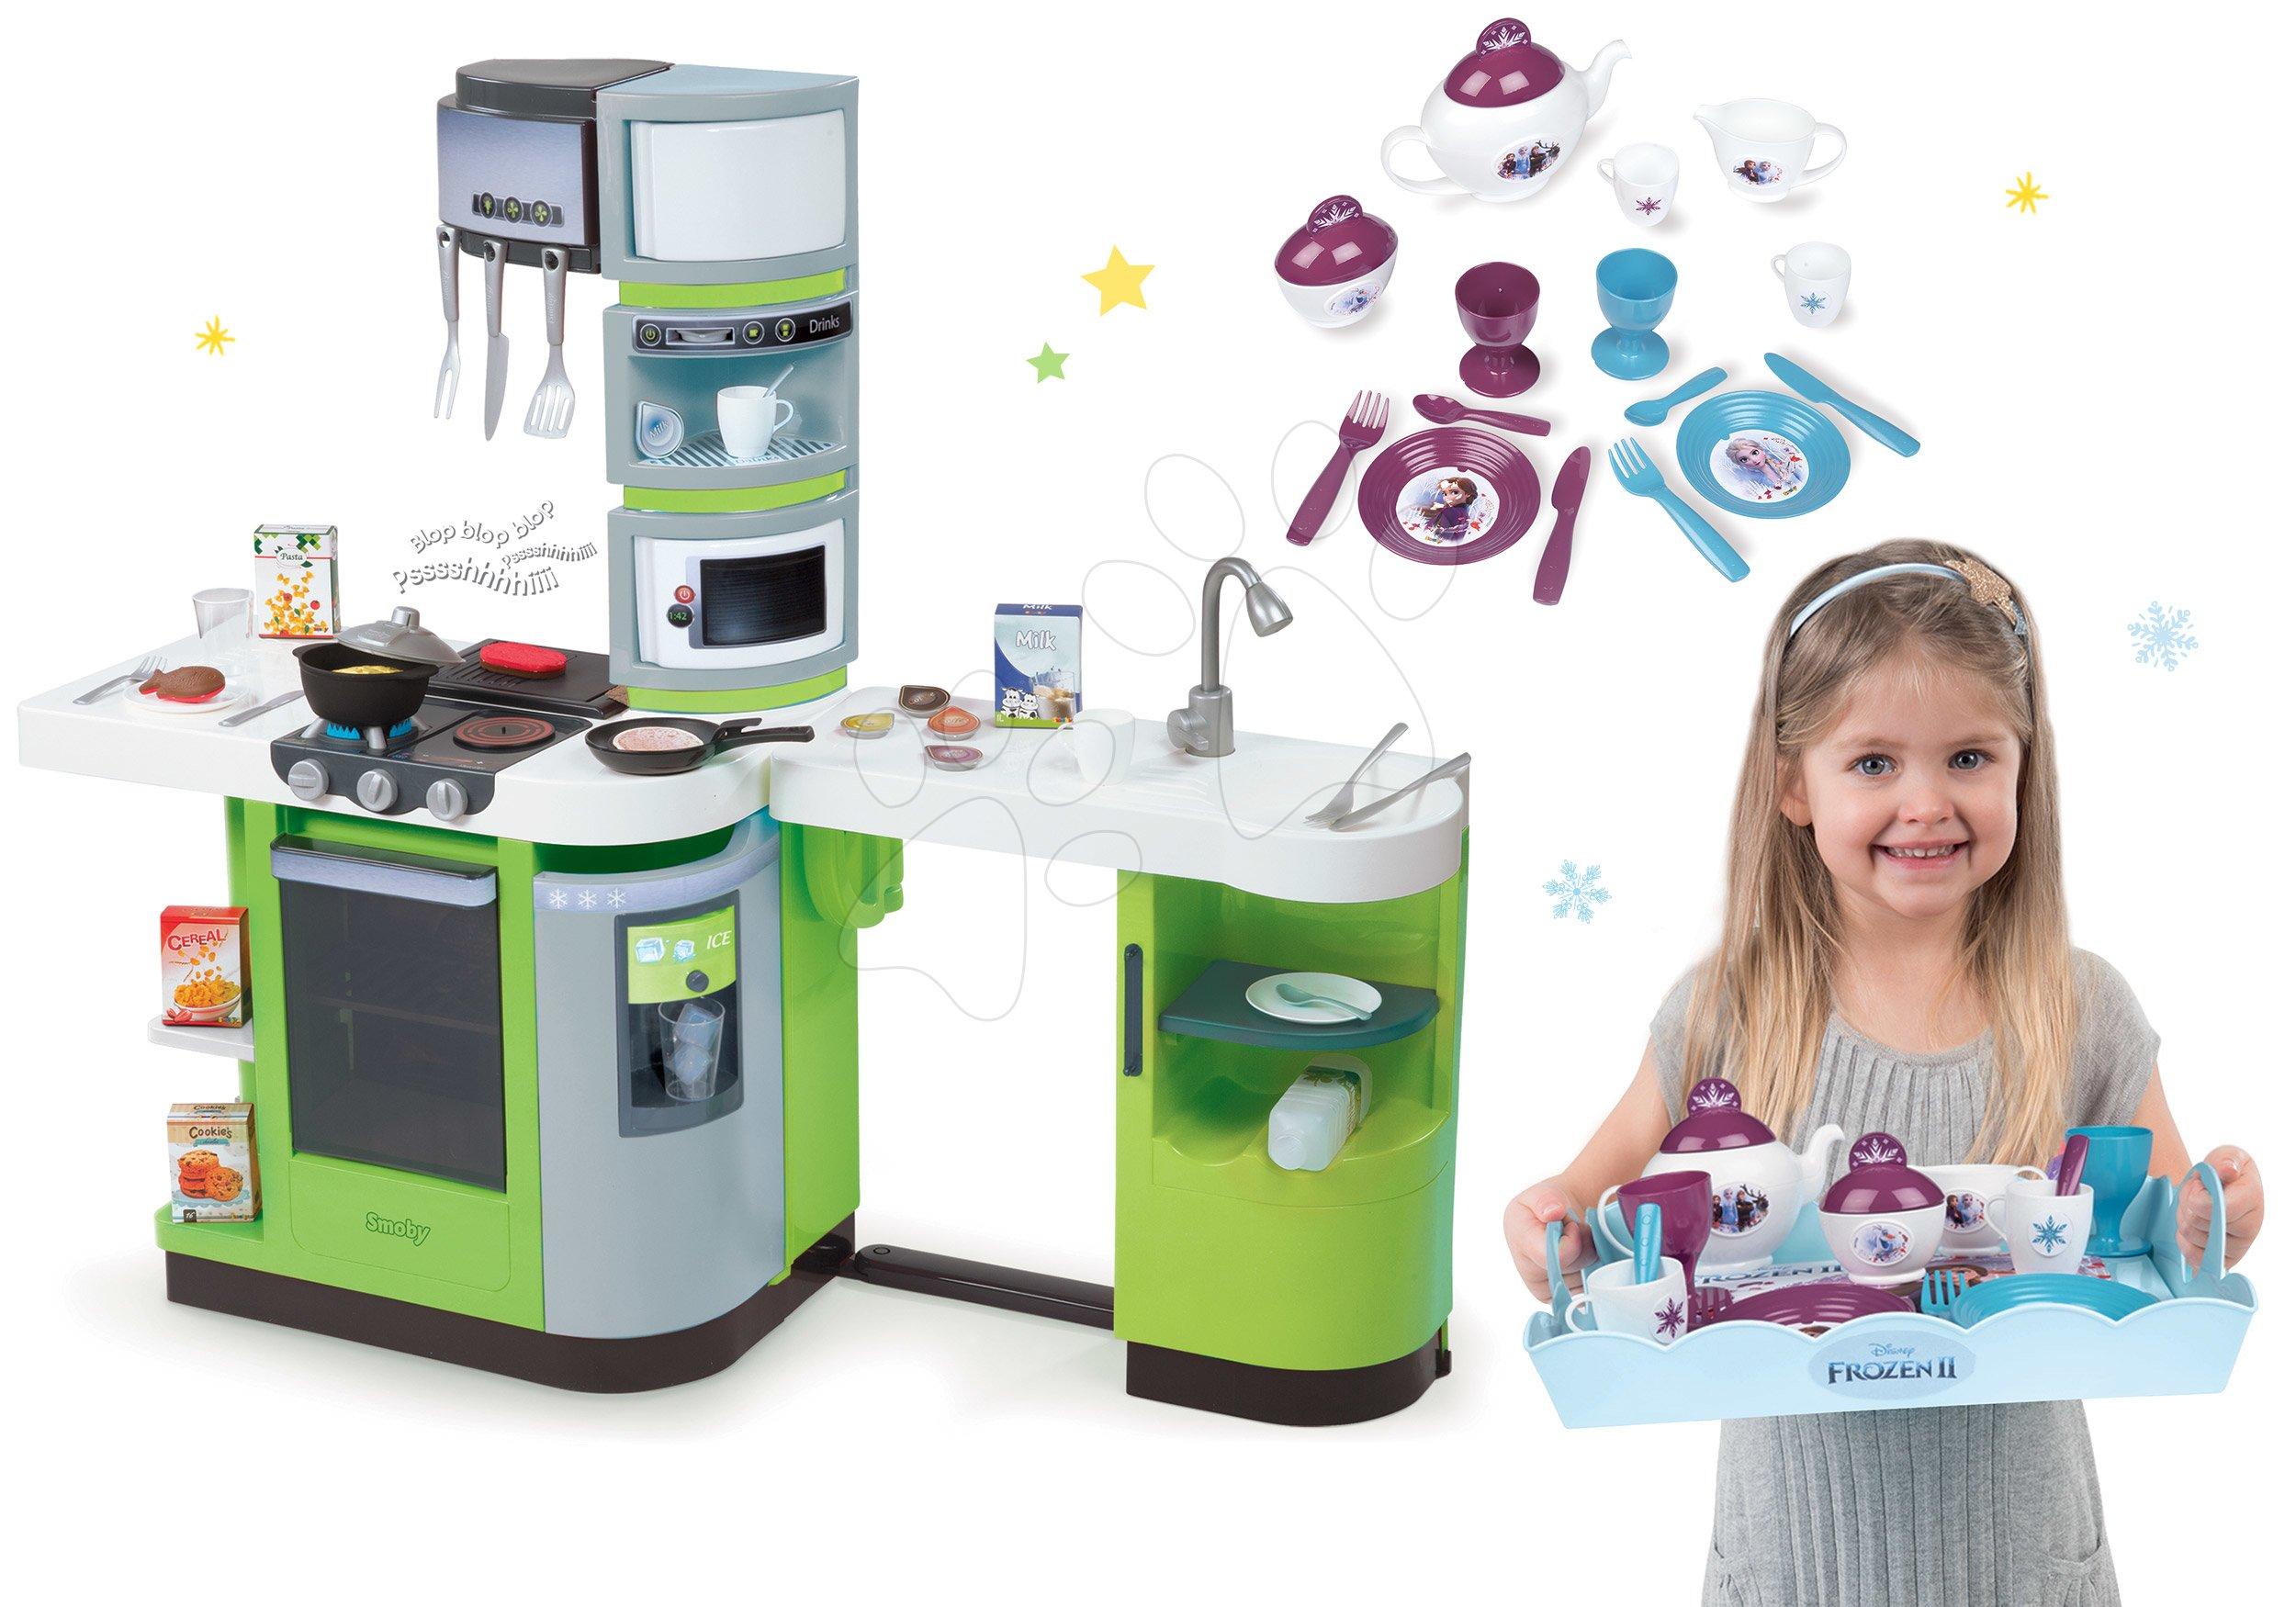 Smoby kuchynka CookMaster Verte a servírovacia tácka Frozen 311102-7